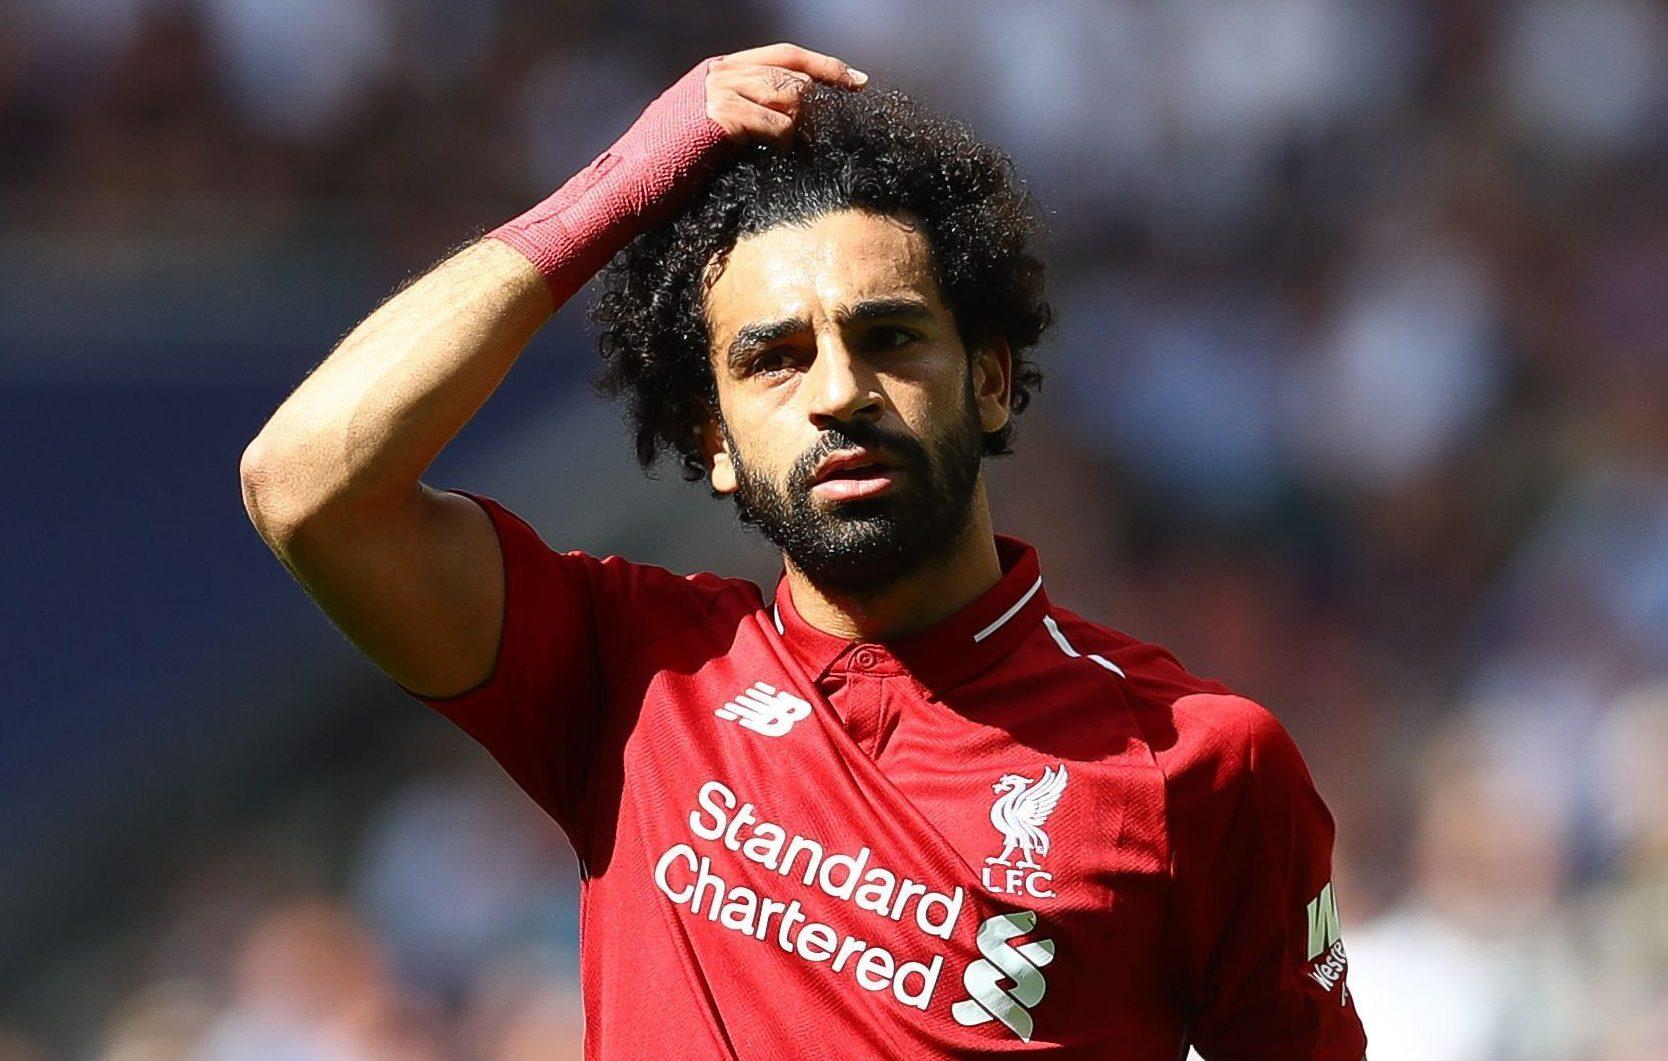 Georginio Wijnaldum responds to Liverpool fans after 'liking' post criticising Mohamed Salah and Sadio Mane